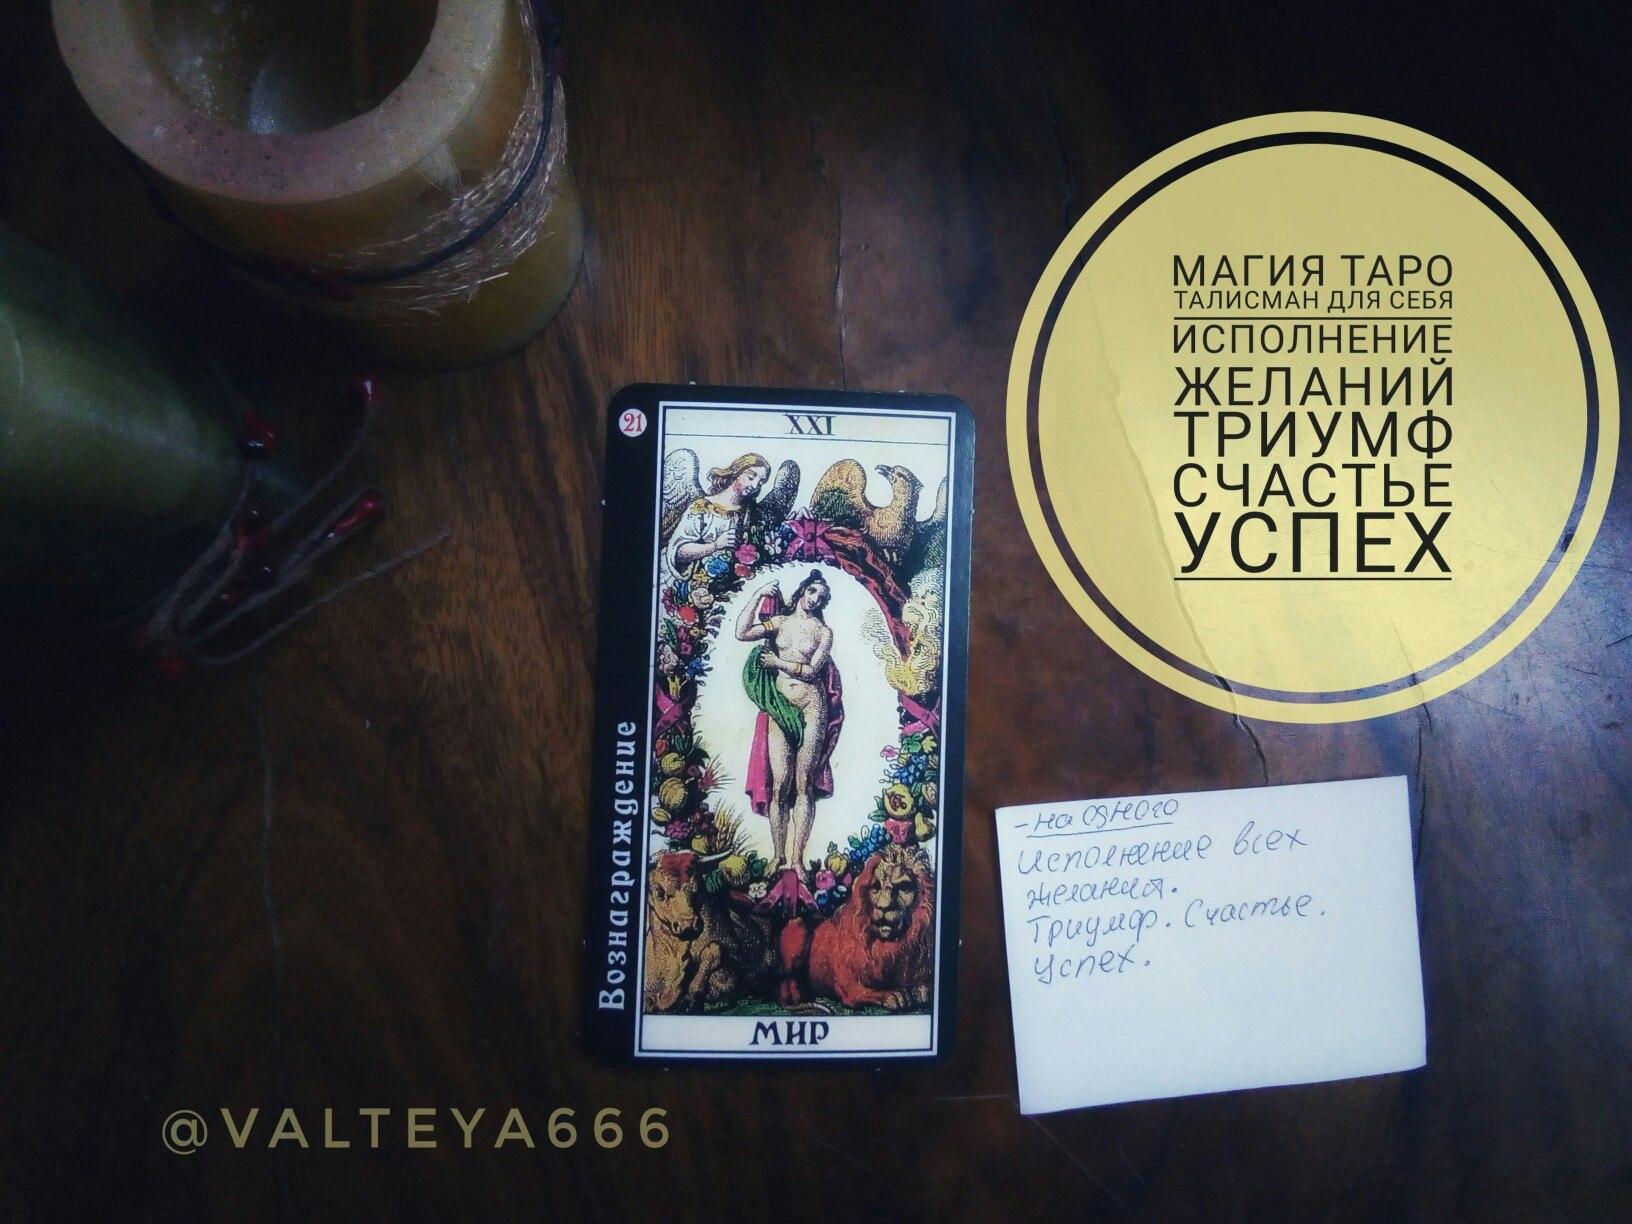 Хештег таро на   Салон Магии и мистики Елены Руденко ( Валтеи ). Киев ,тел: 0506251562  LaI9TLV2hTQ